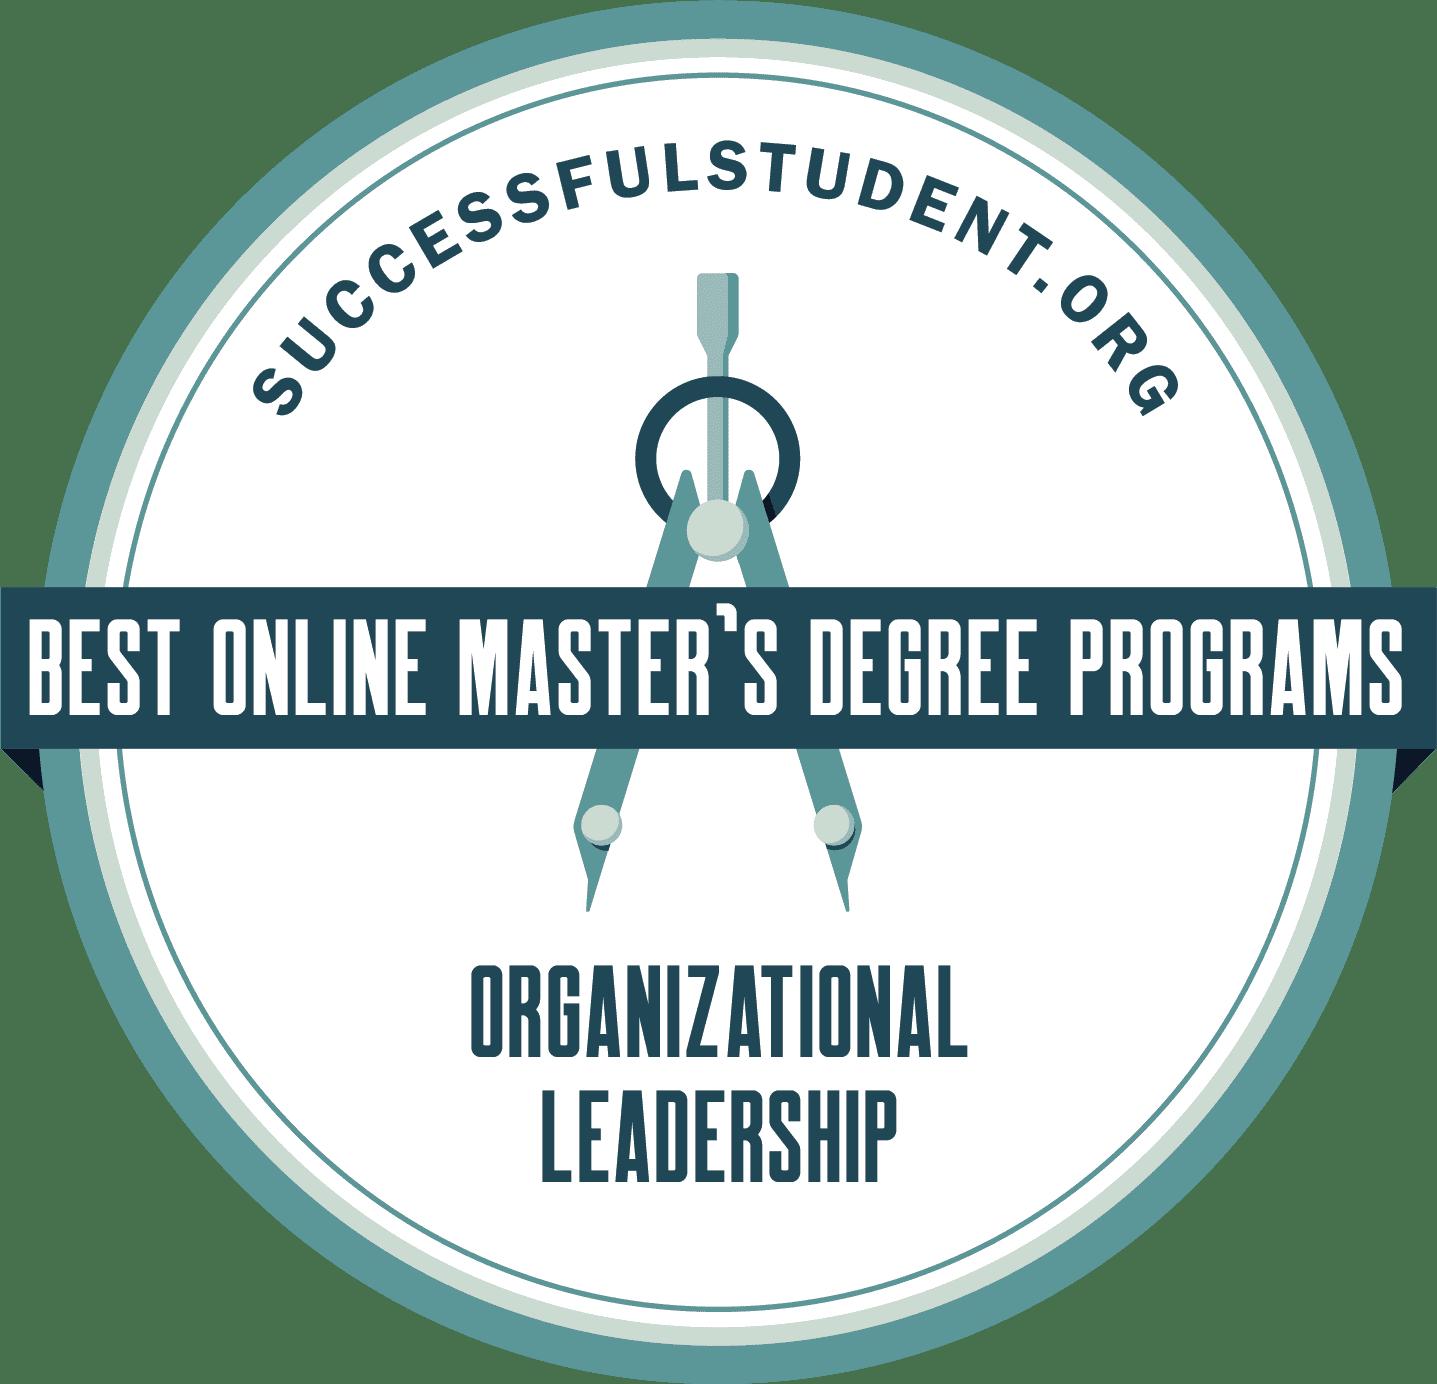 The Best Online Master's in Organizational Leadership Degree Programs's Badge